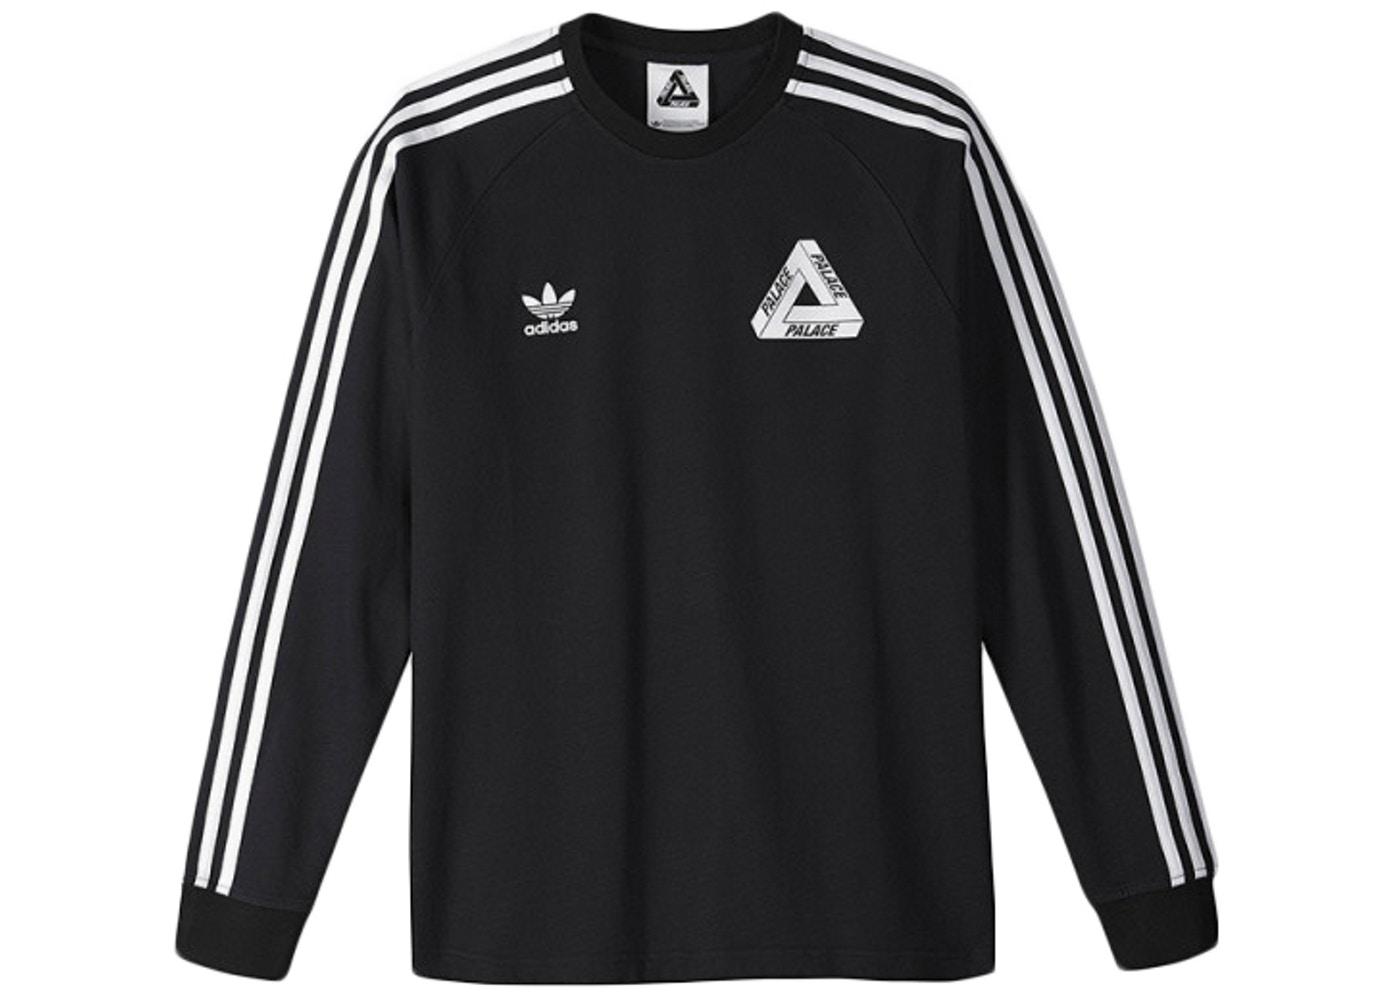 amanecer vídeo irregular  Palace adidas Longsleeve Team Shirt Black - SS15